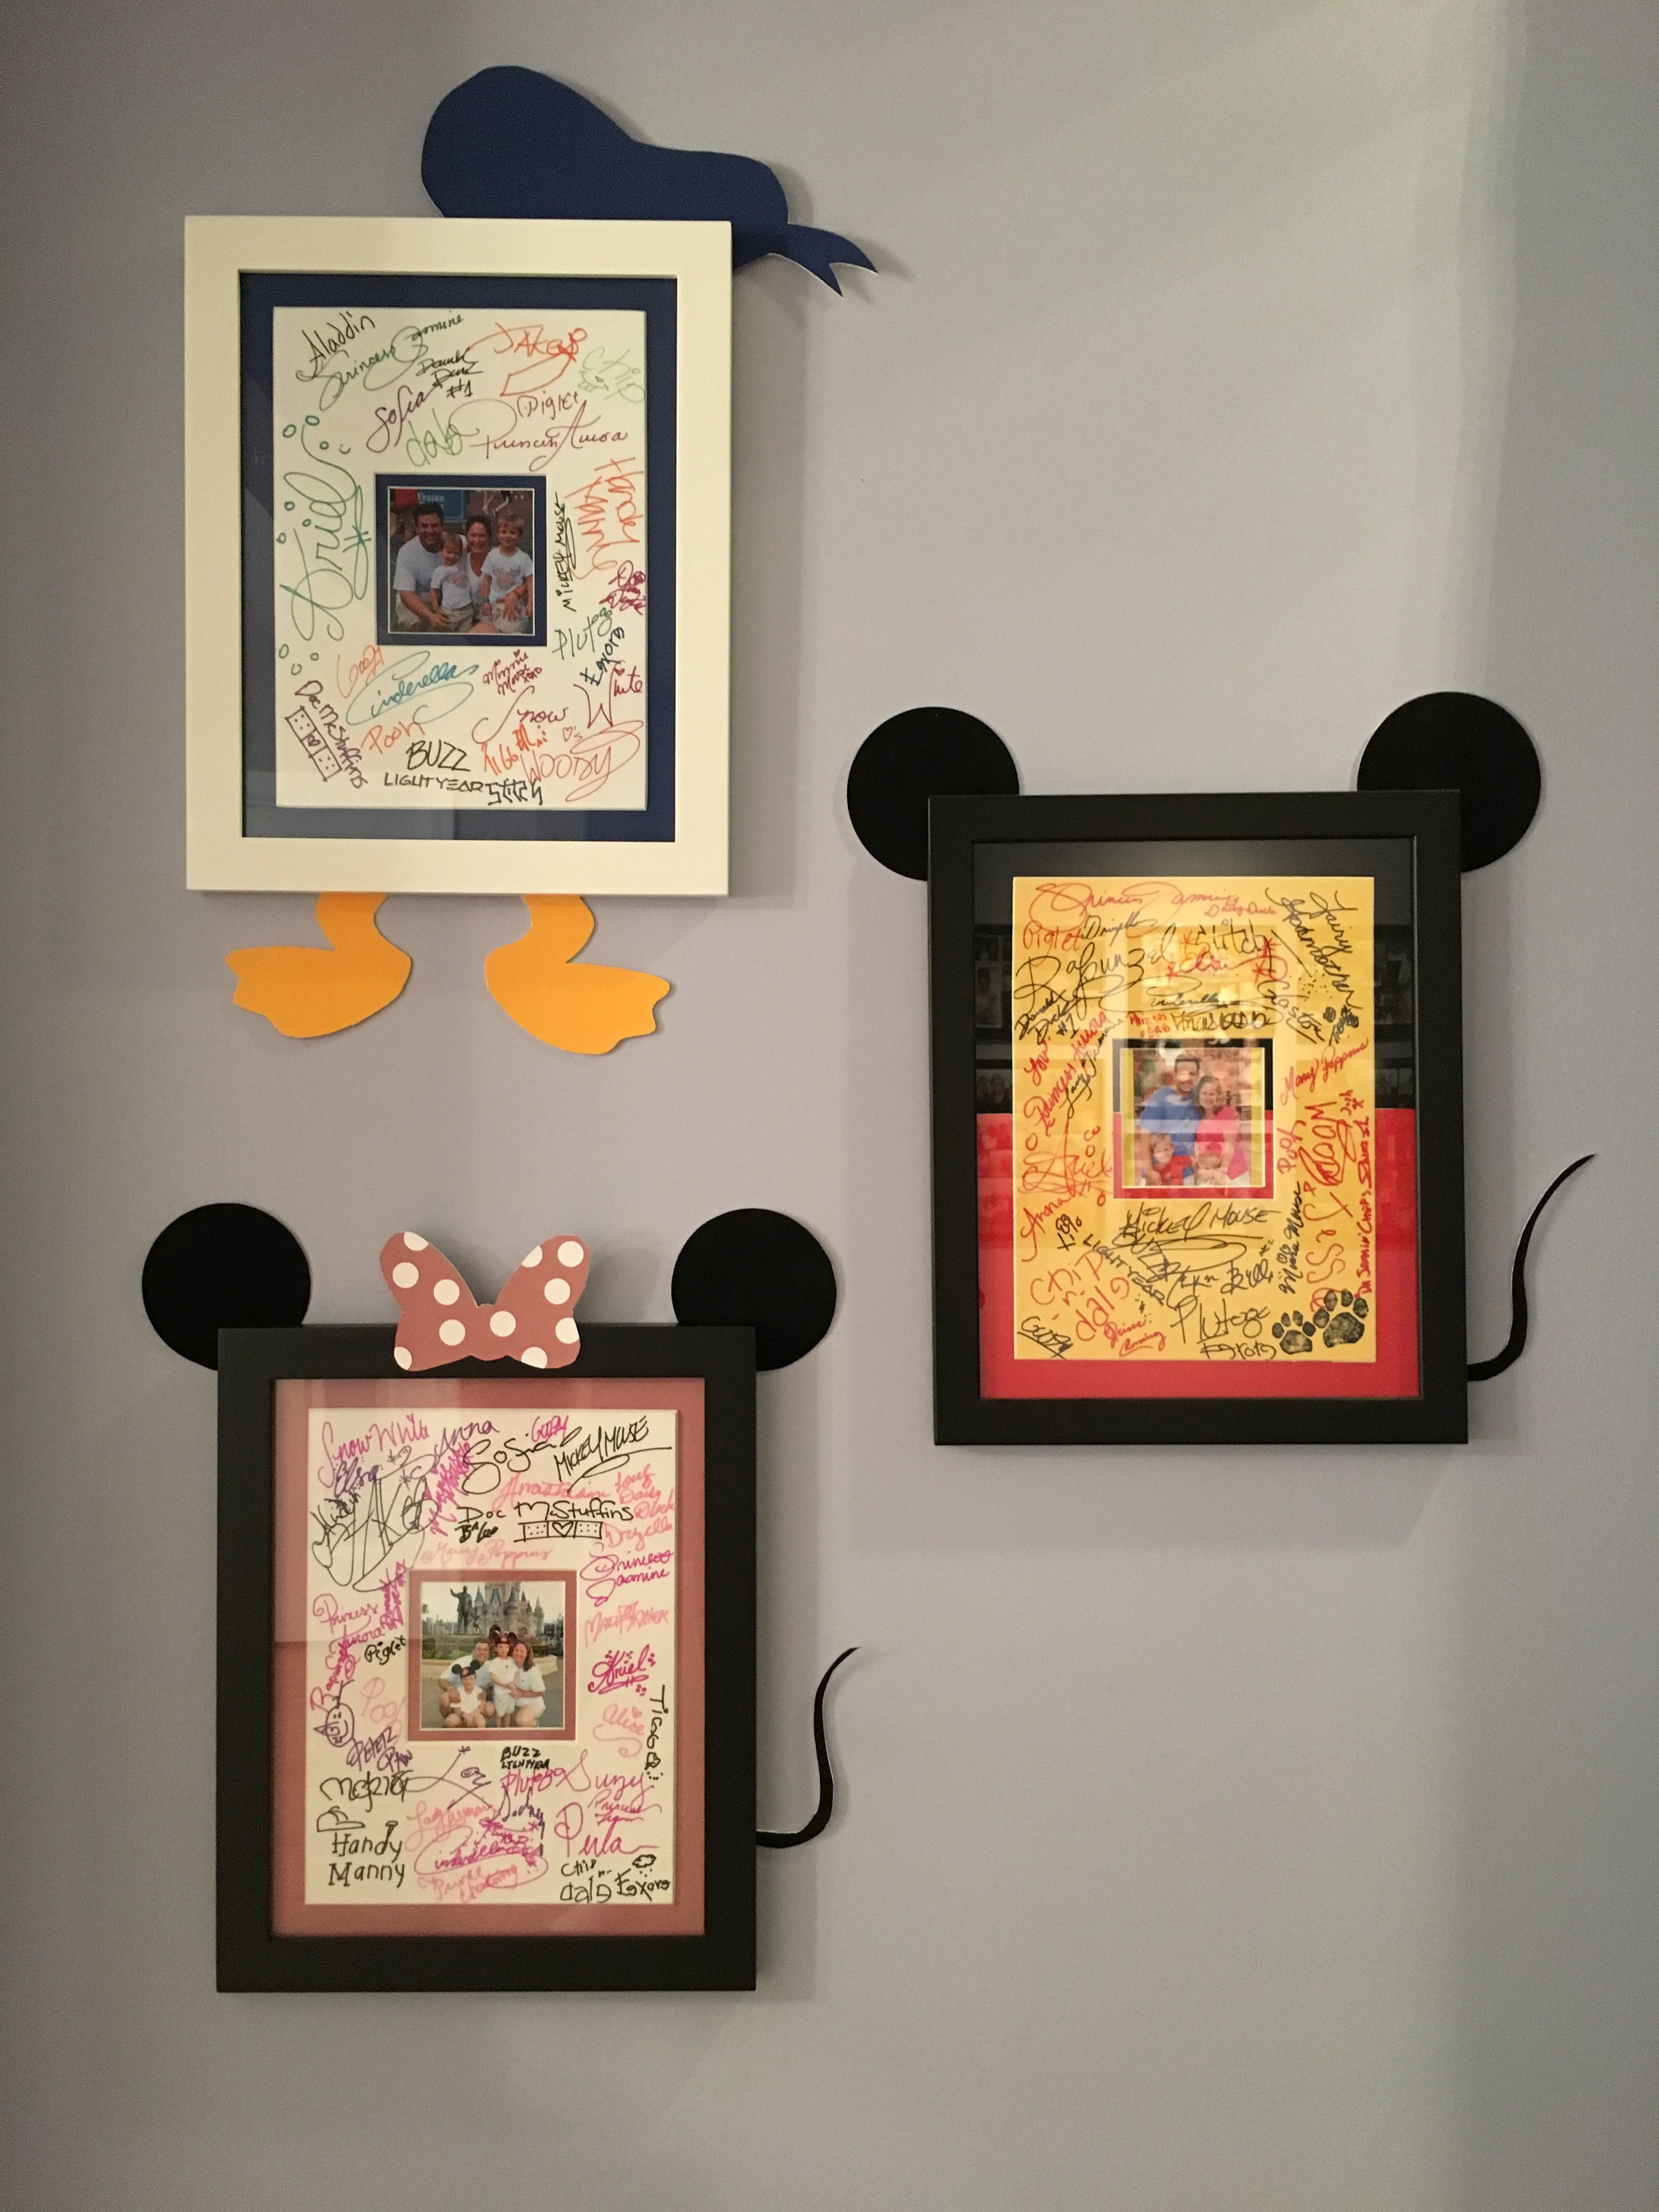 Disney character autograph signing mat frames | fun projects | Pinterest